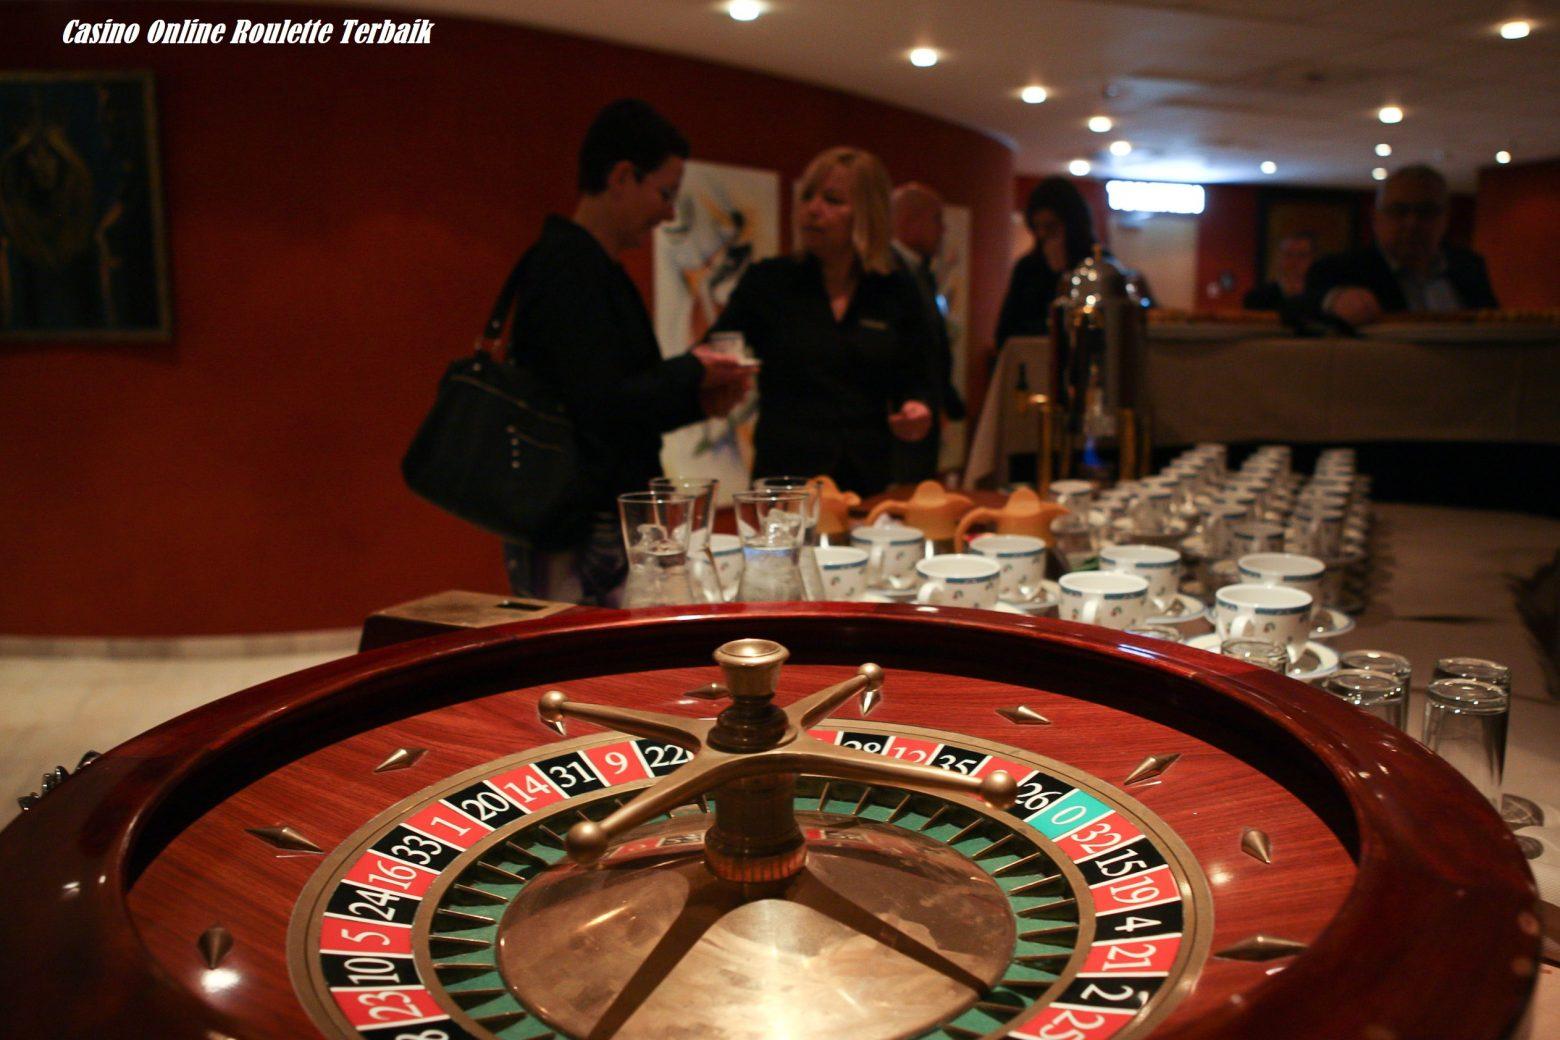 Agen Casino Online Roulette Terbaik